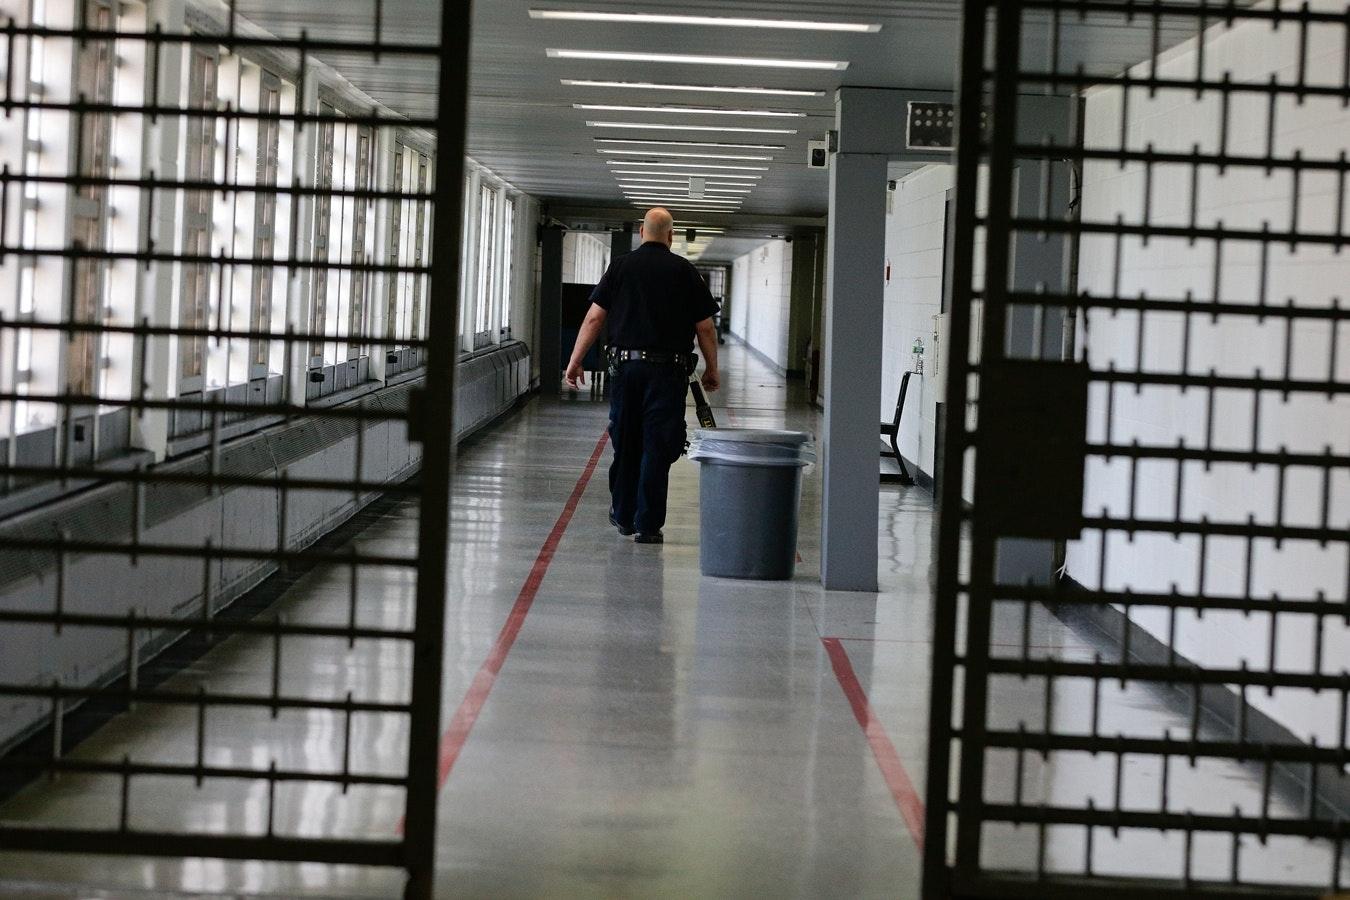 A man walking in a corridor.